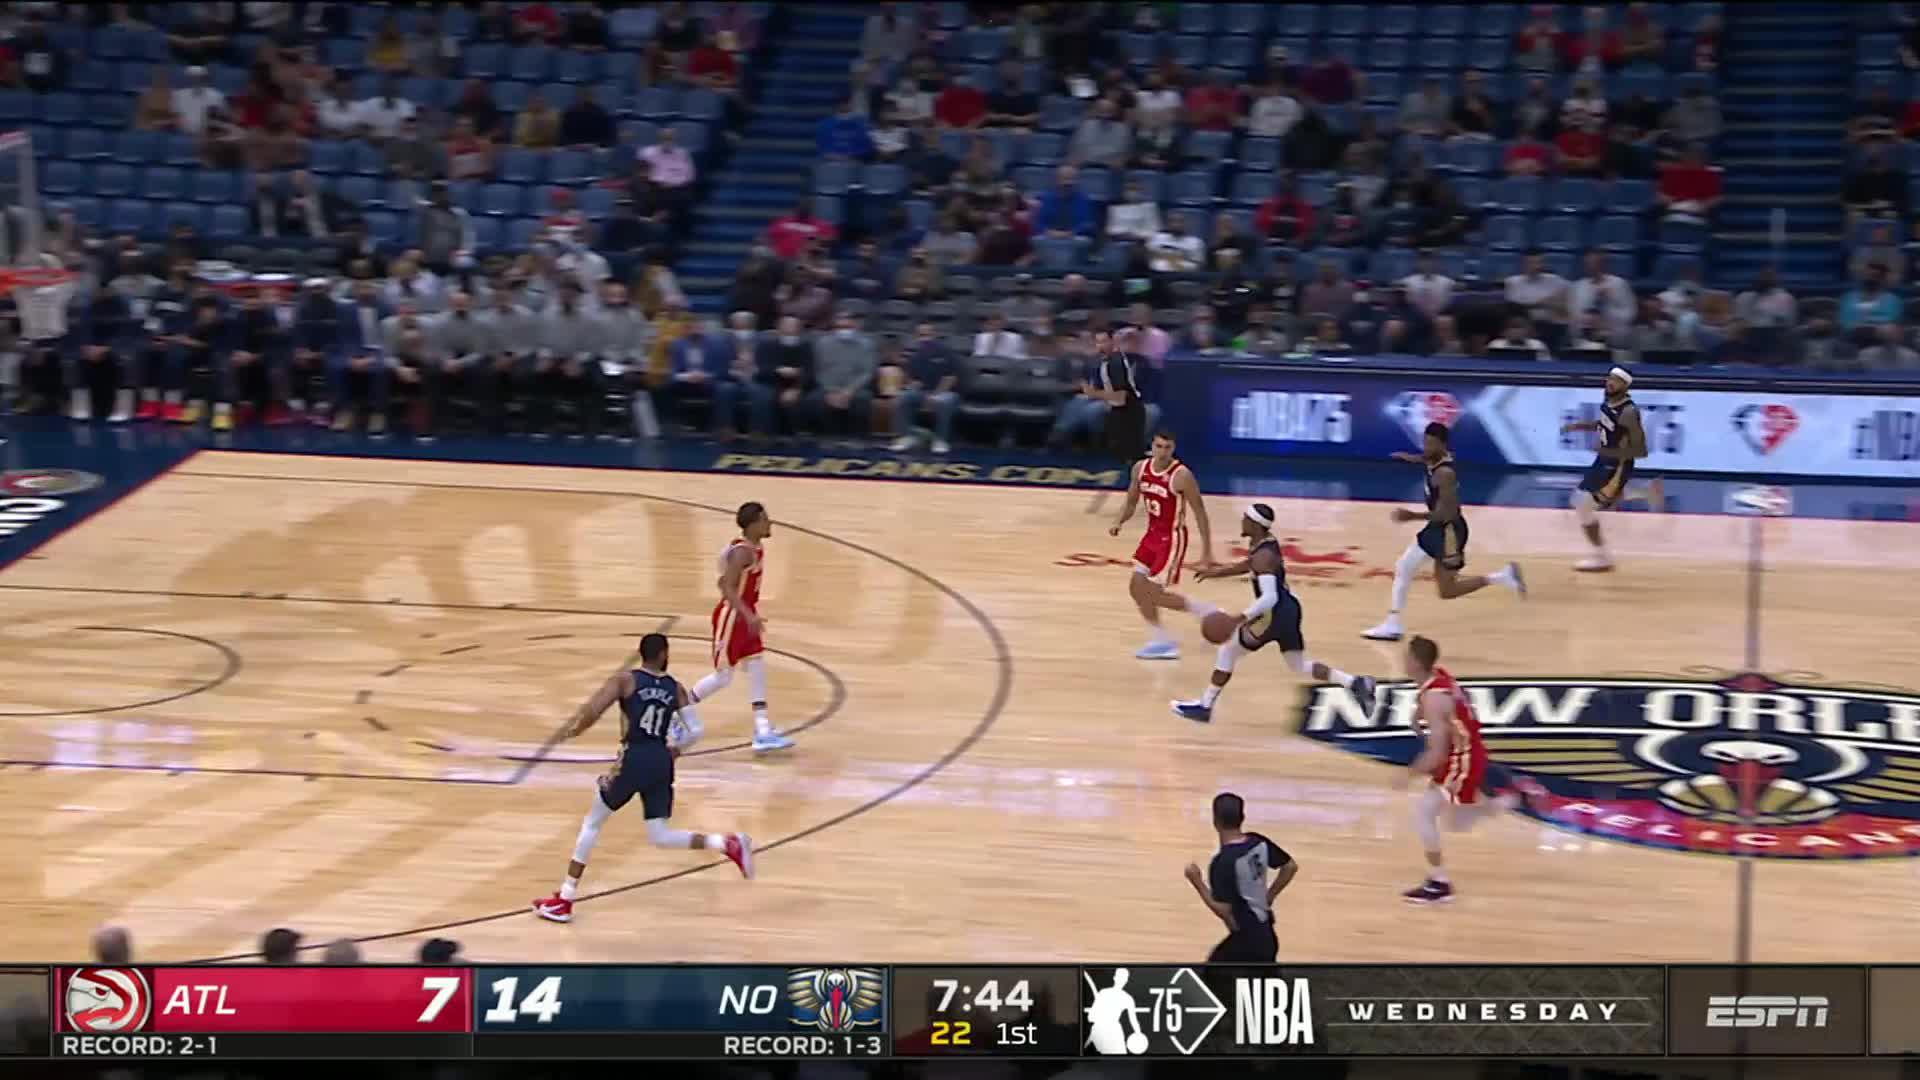 Devonte' Graham fast-break finish | Pelicans-Hawks Highlights 10/27/21